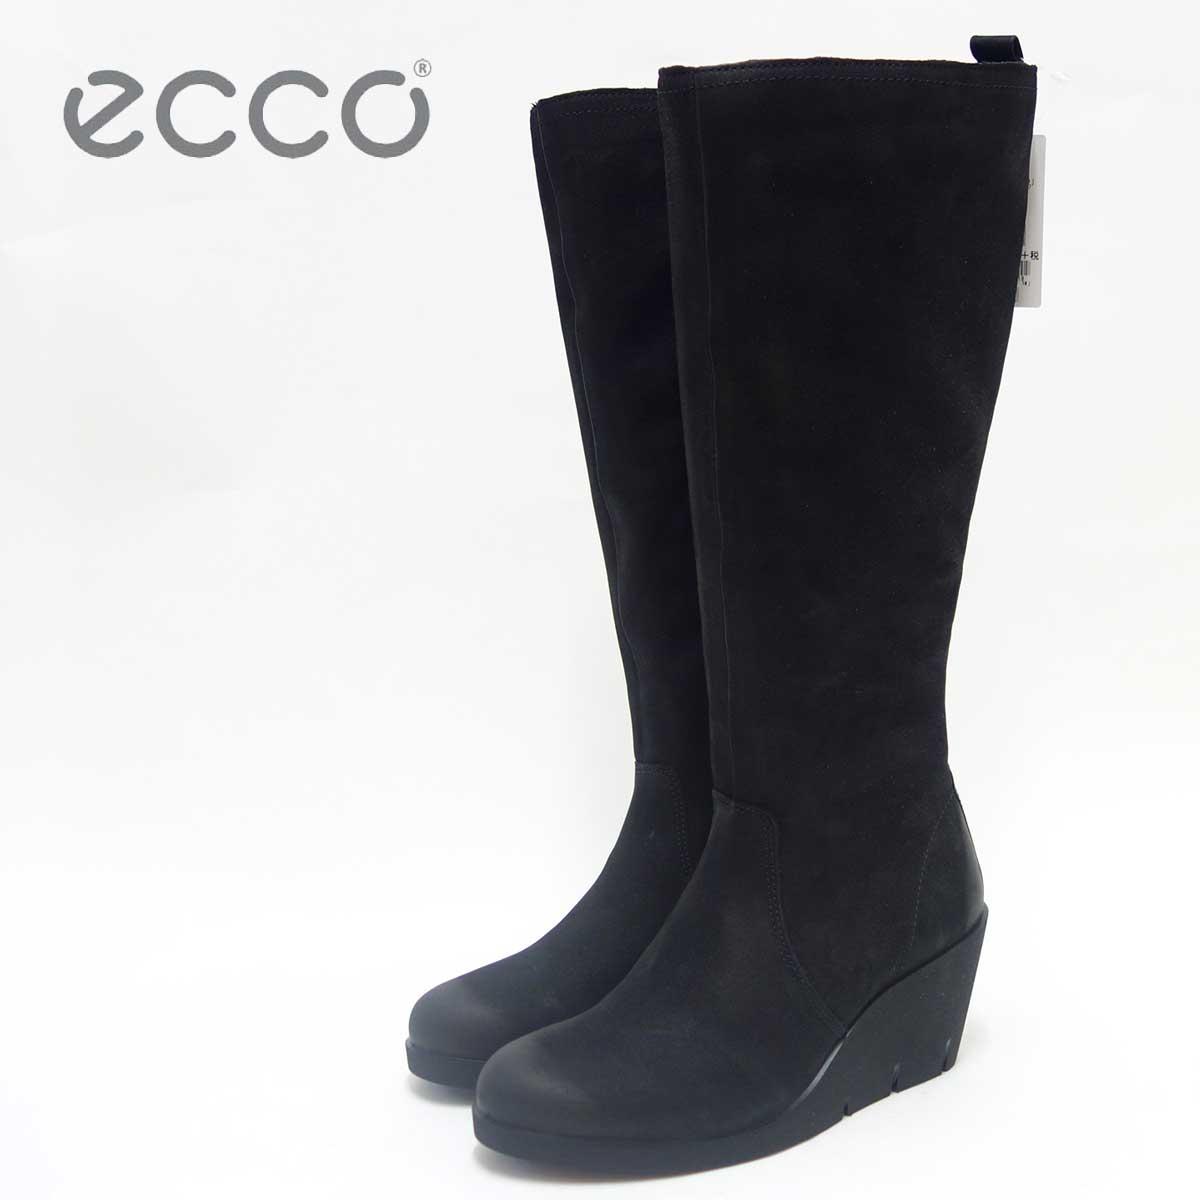 ECCO エコー 282513 ブラック(レディース)ヌバックレザー ウェッジヒール ロングブーツECCO BELLA WEDGE High cut zip「靴」 エコーの靴は足の快適さと健康を追求します ☆送料無料・手数料無料☆